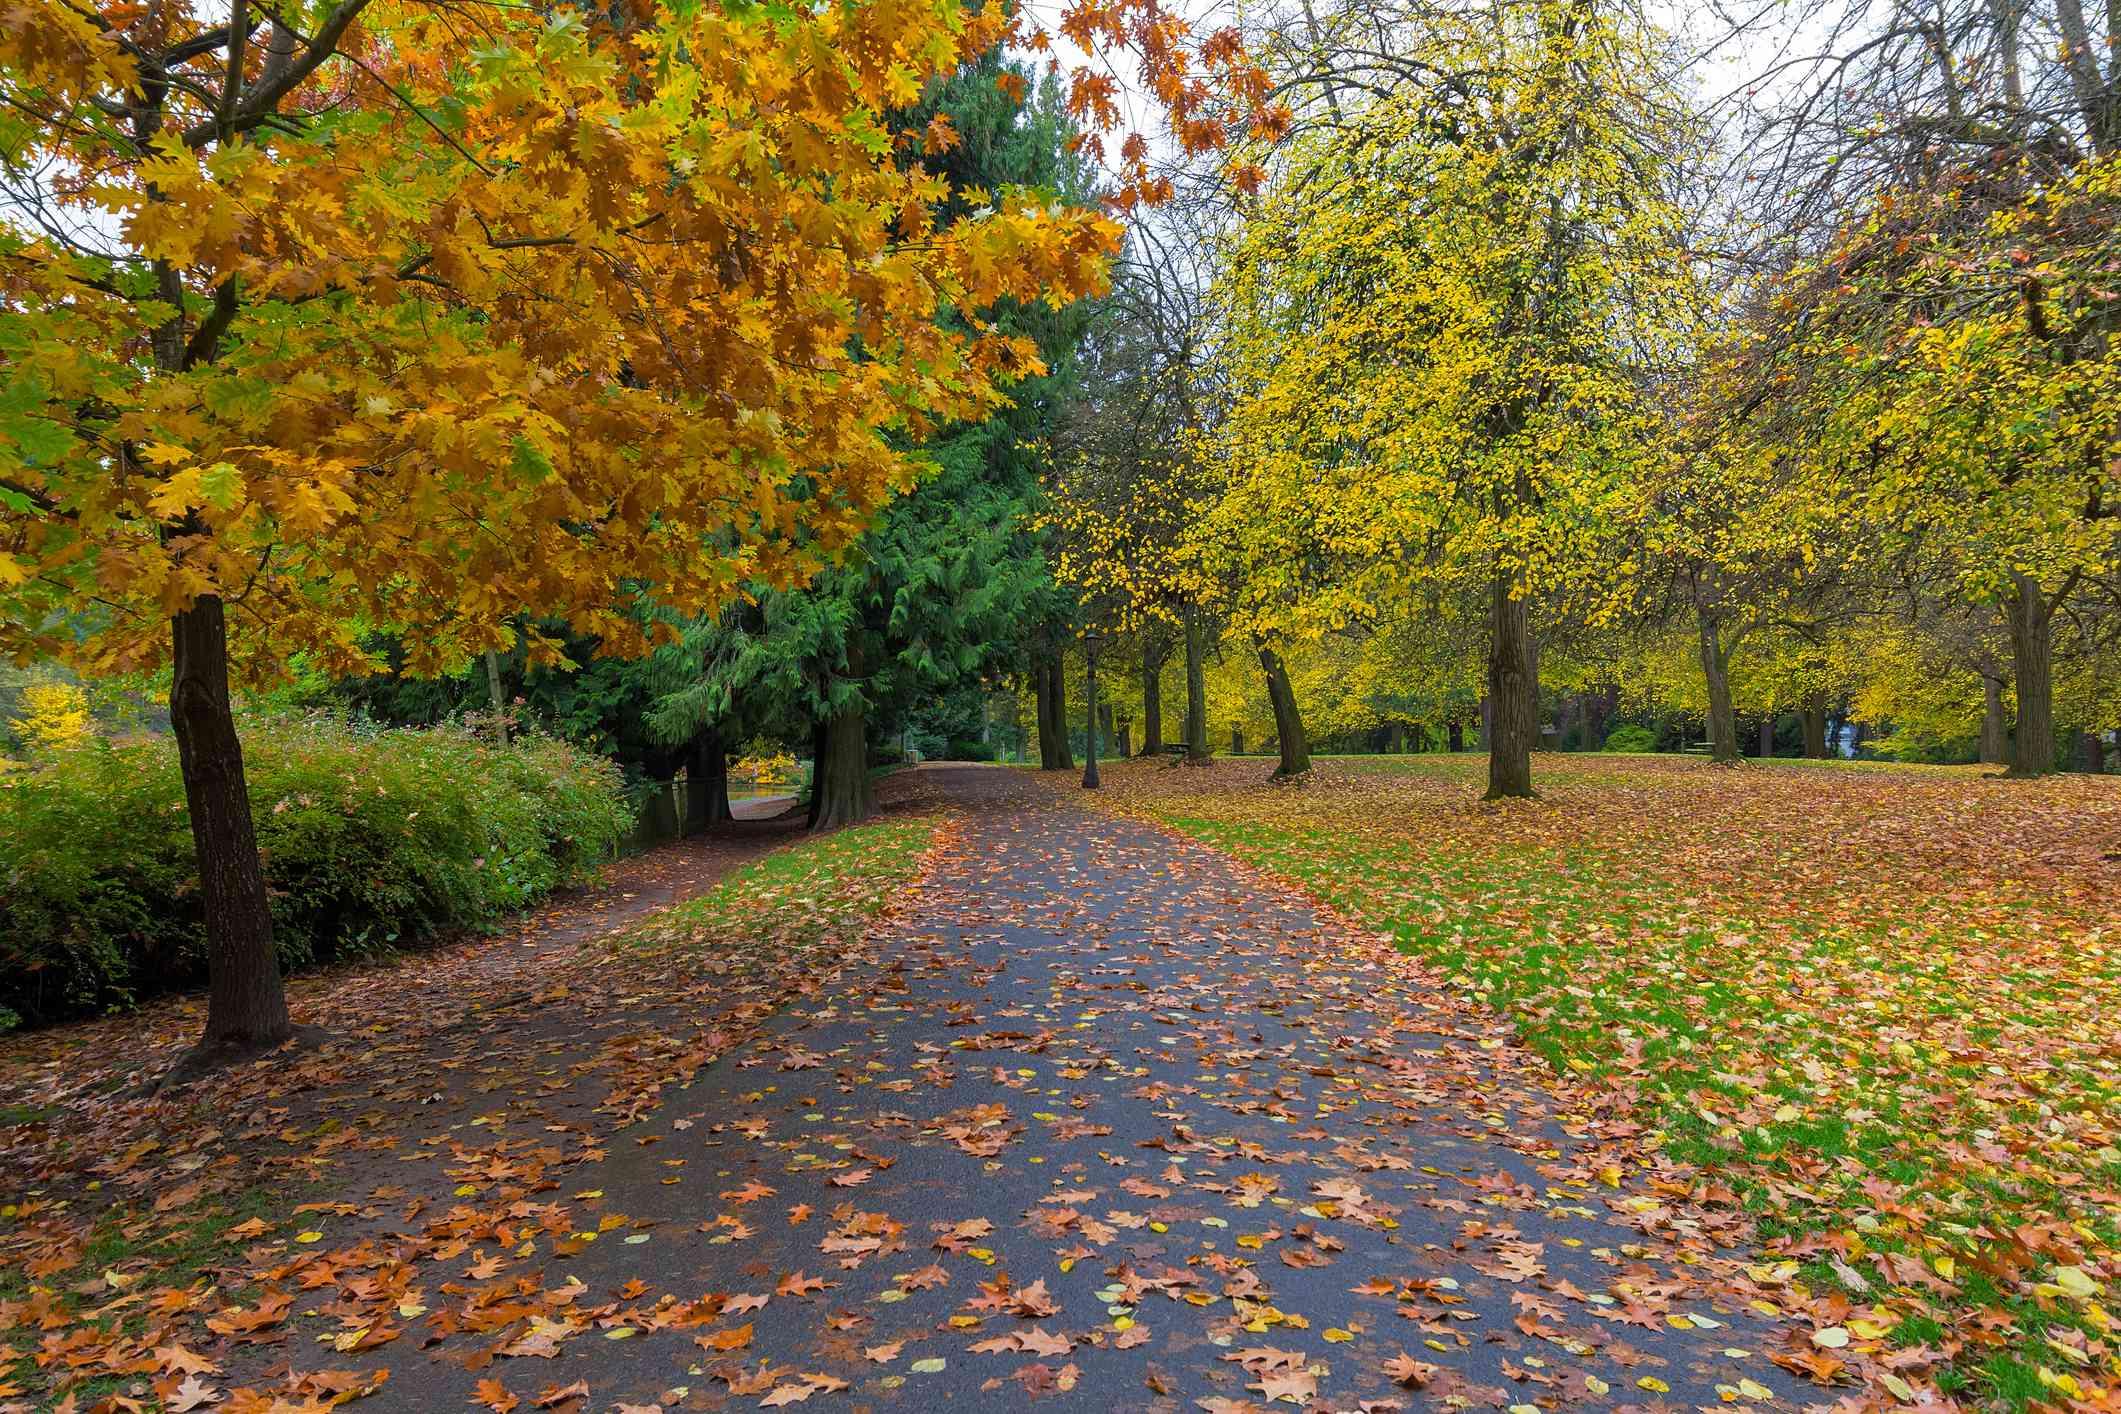 Fall foliage at Laurelhurst Park in city of Portland Oregon during Autumn season